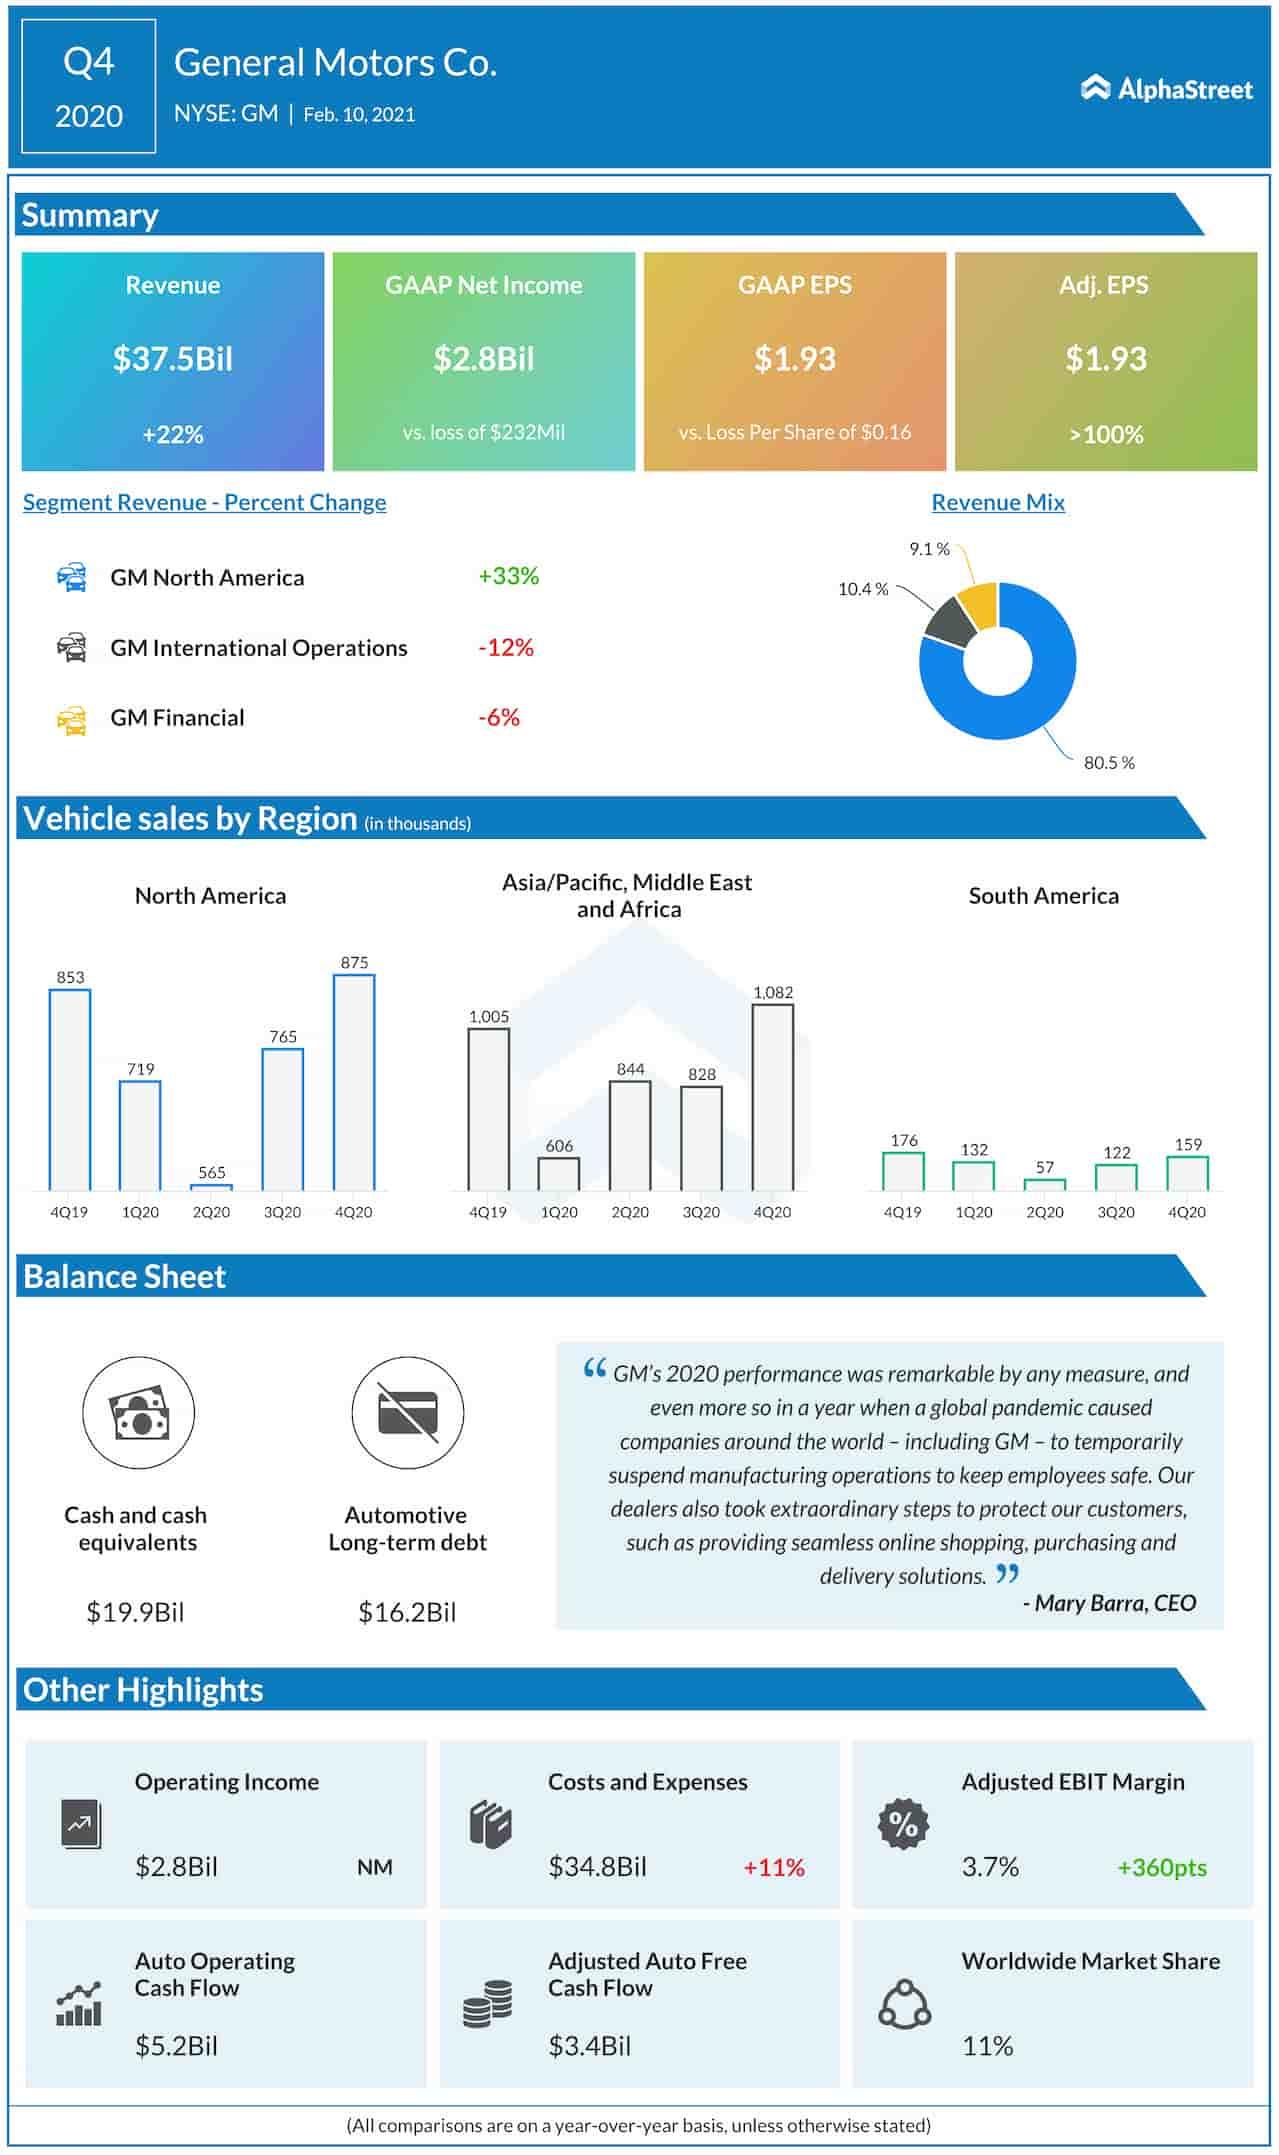 General Motors Q4 2020 earnings infographic